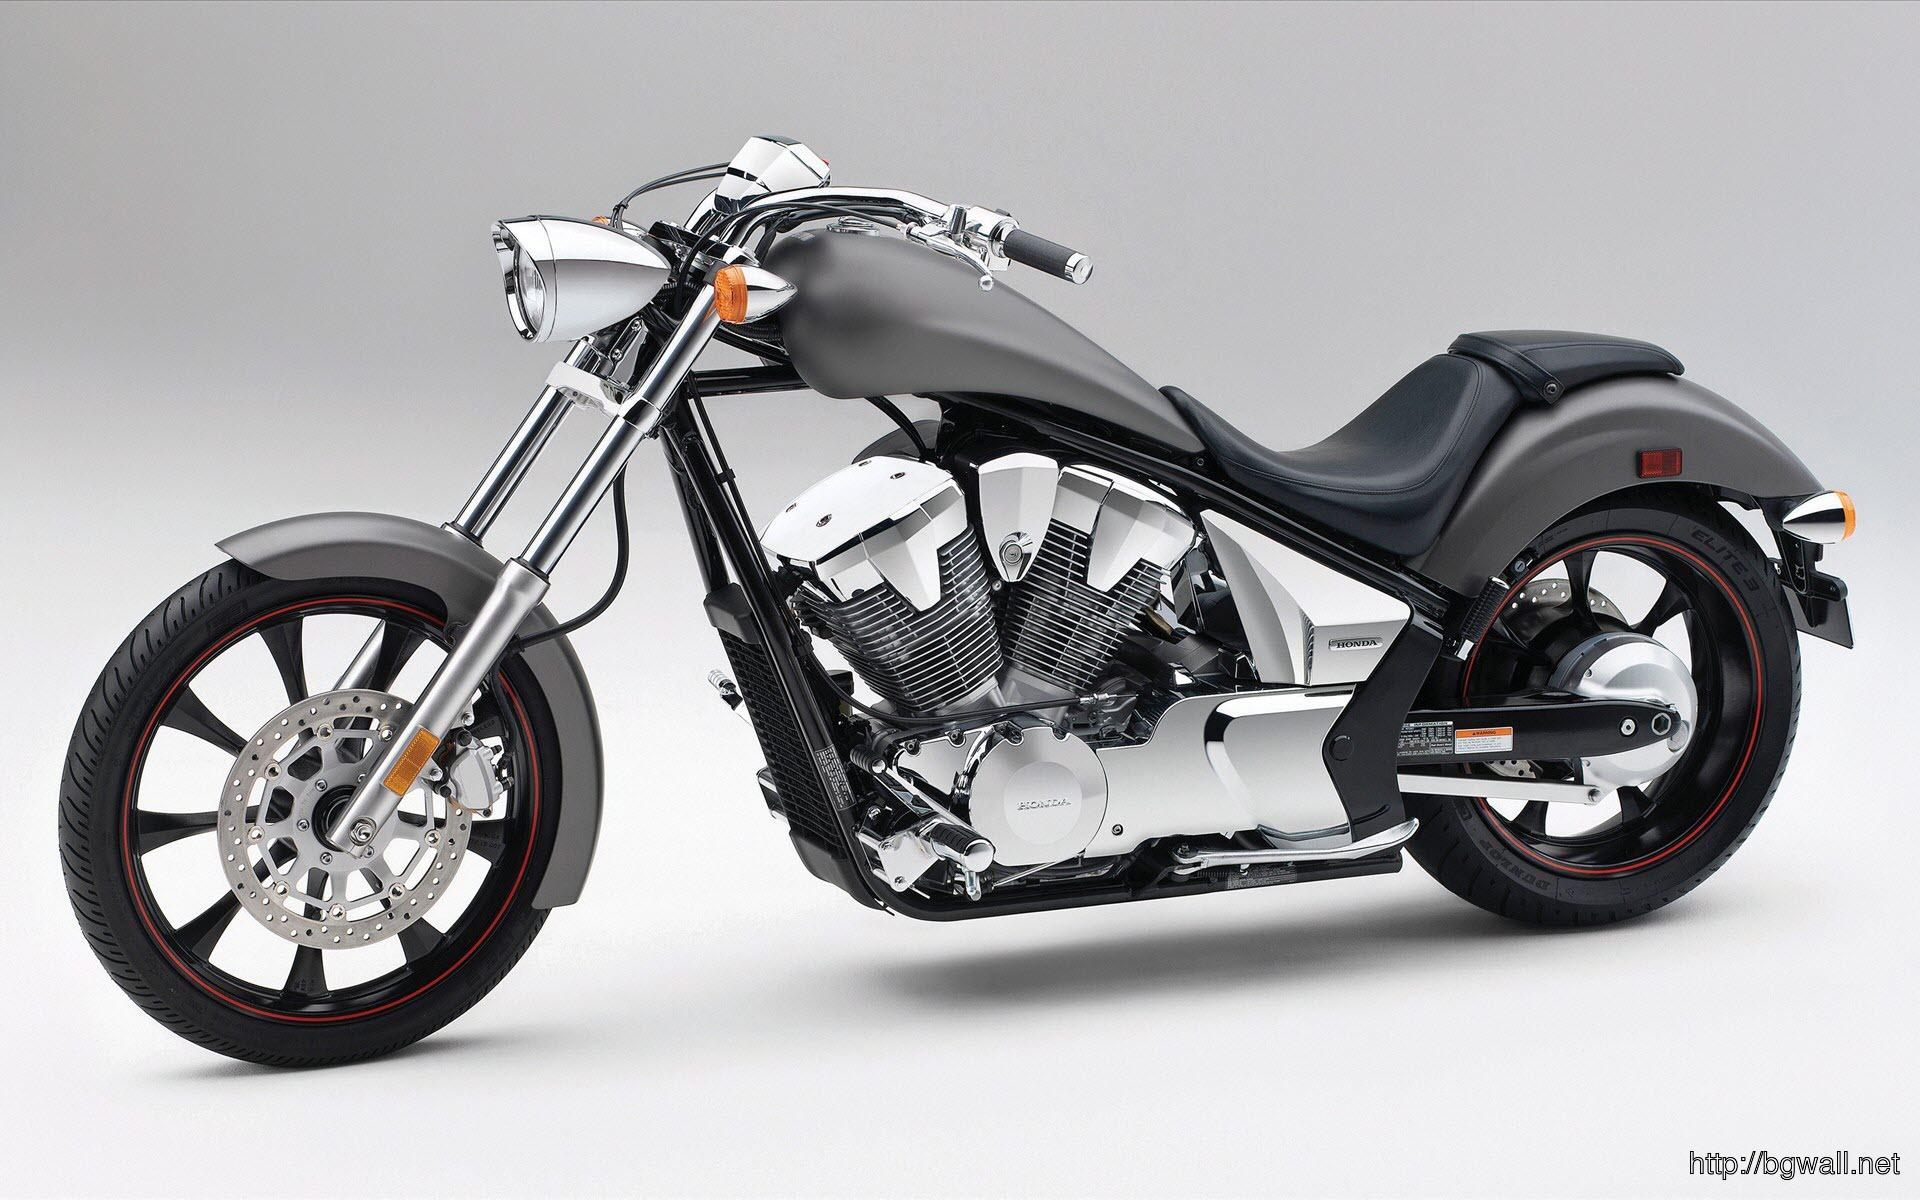 Superb Dark Honda Fury Sports Bike Full Size